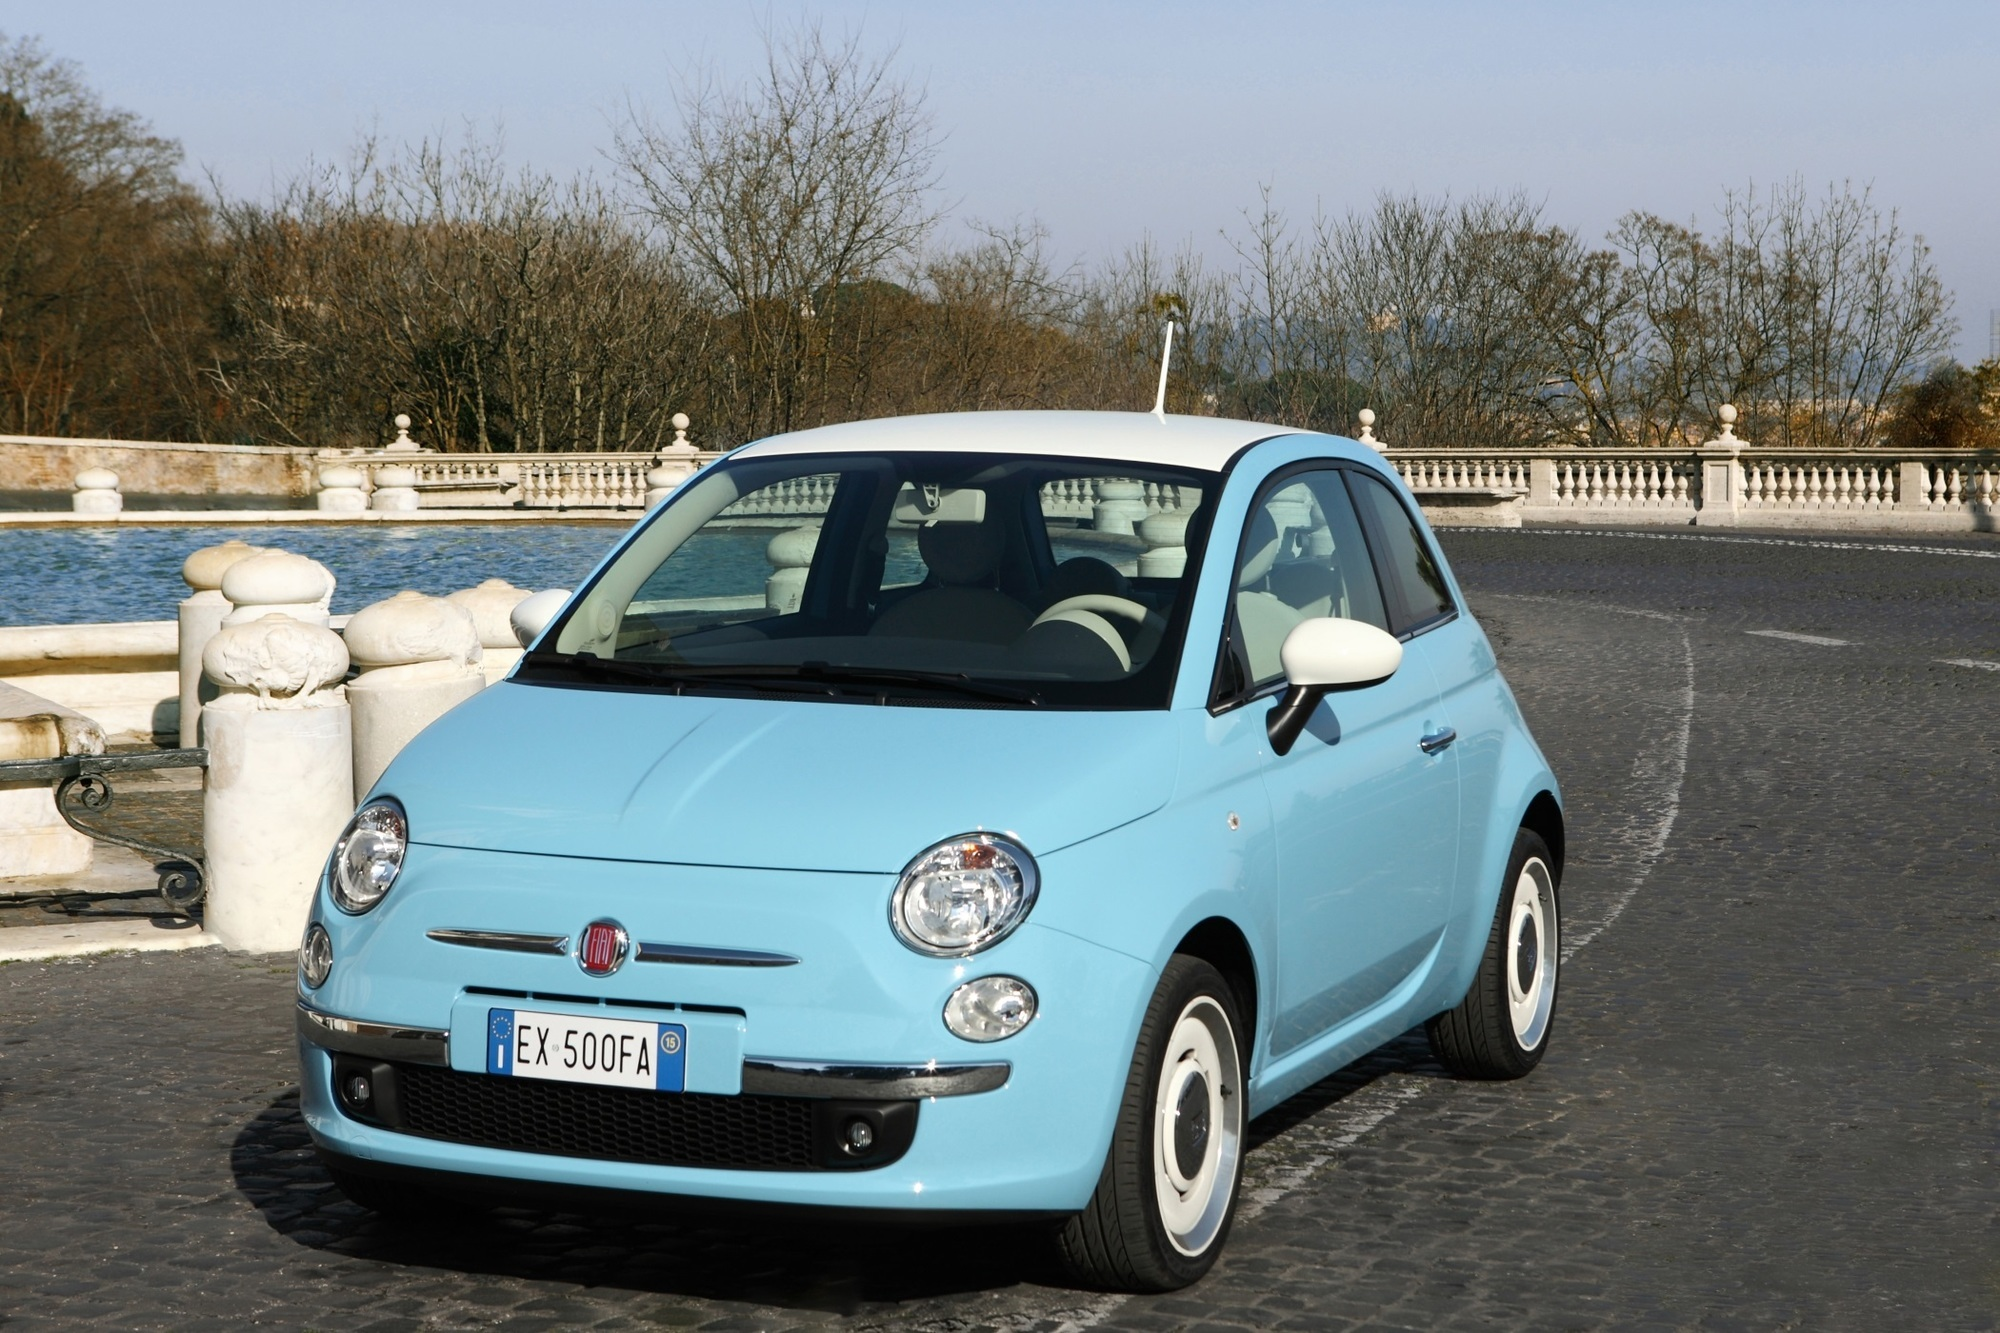 Fiat 500 Vintage ´57 - Ciao, bello